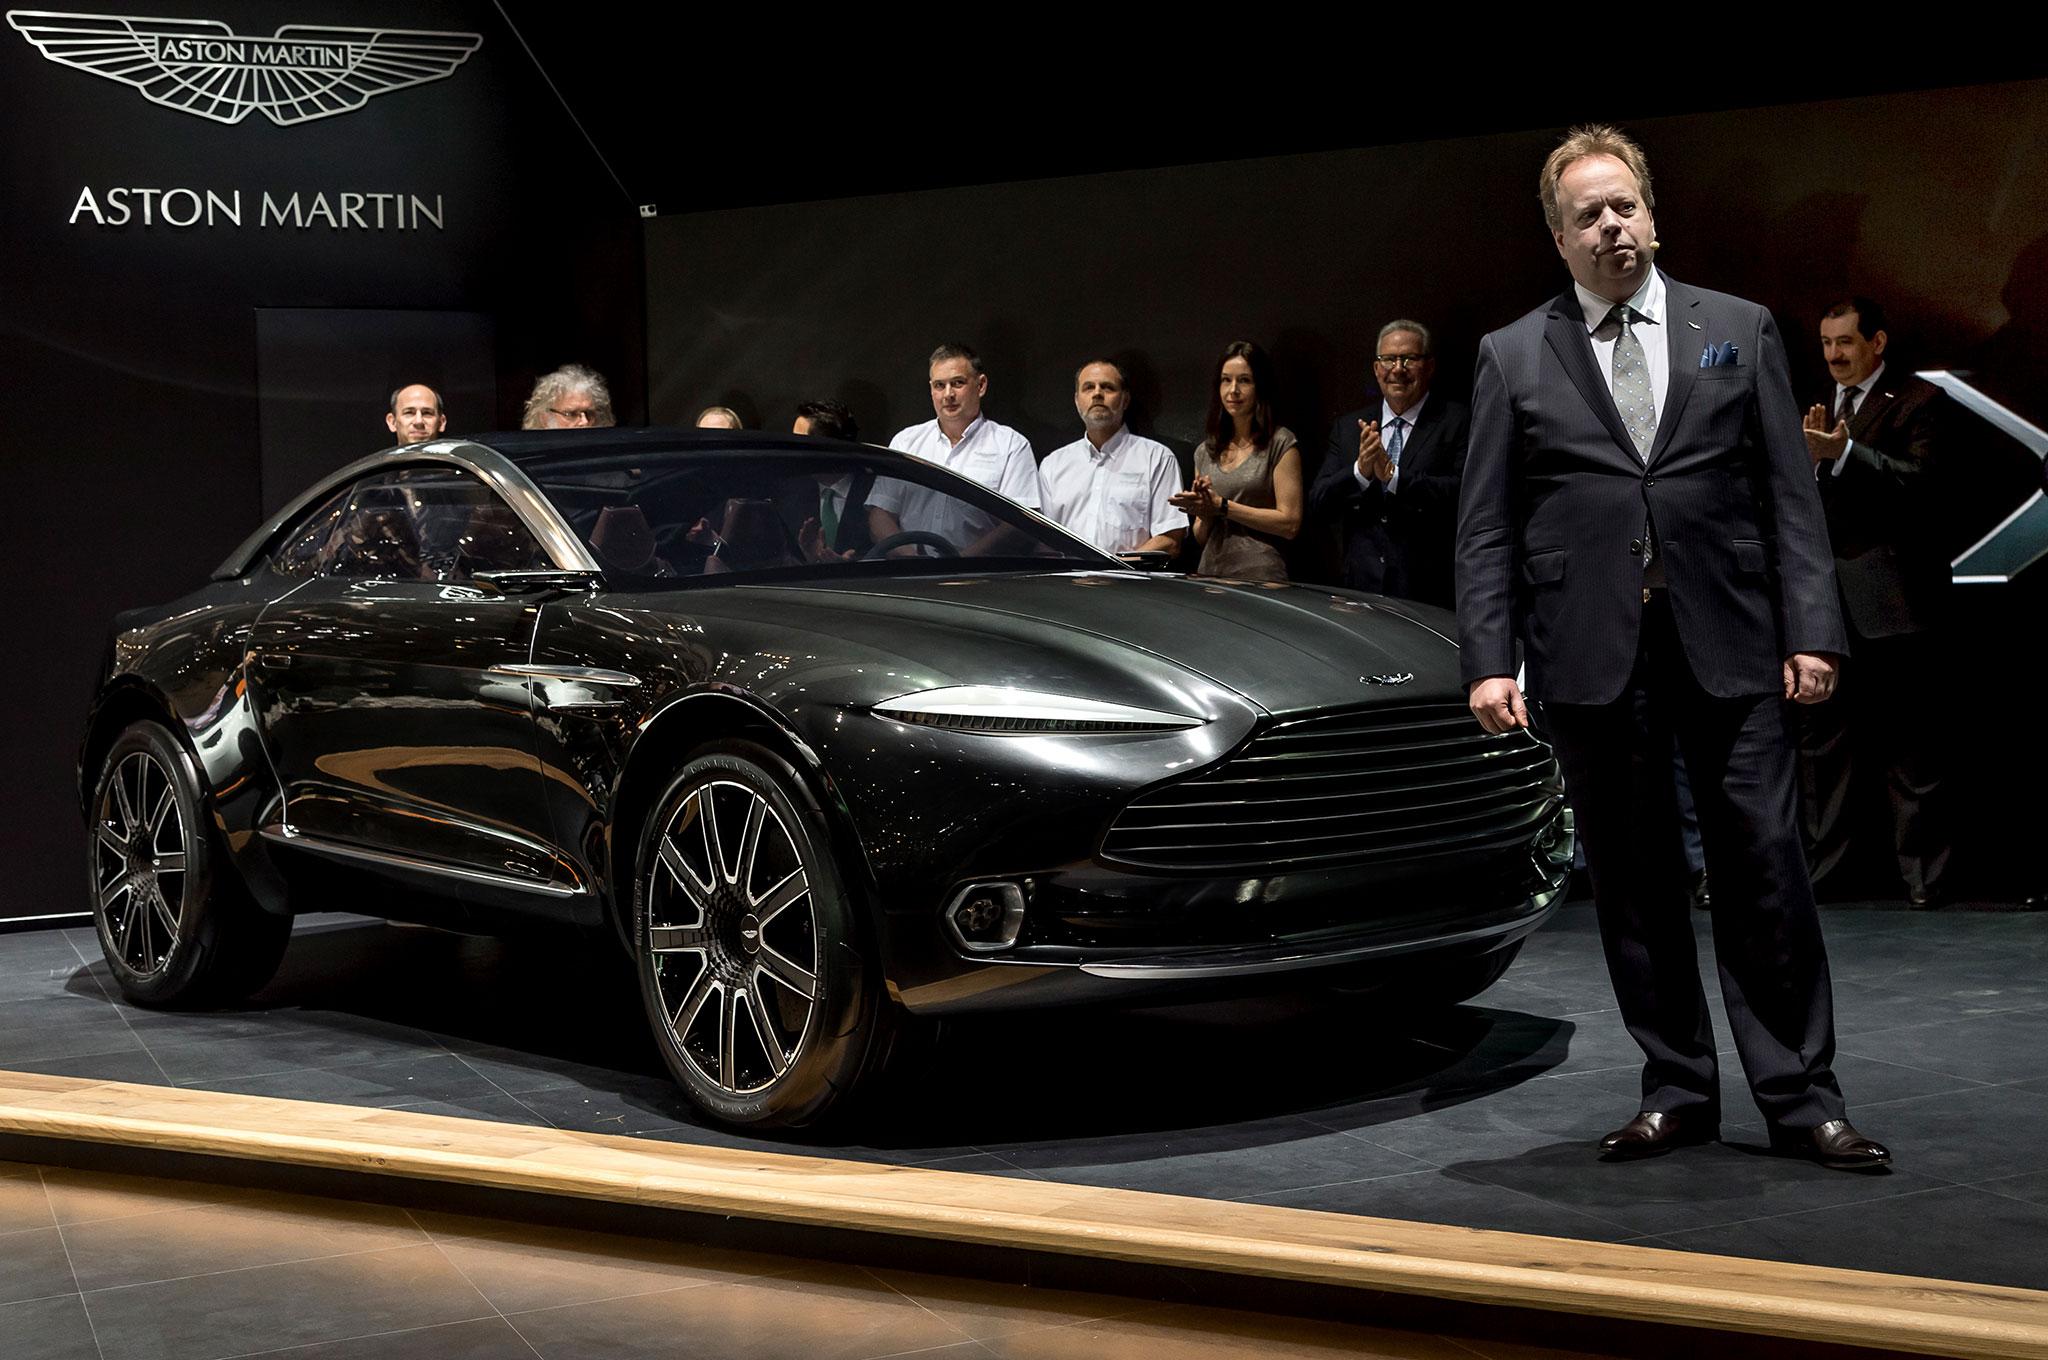 aston martin planning geneva motor show surprise | automobile magazine